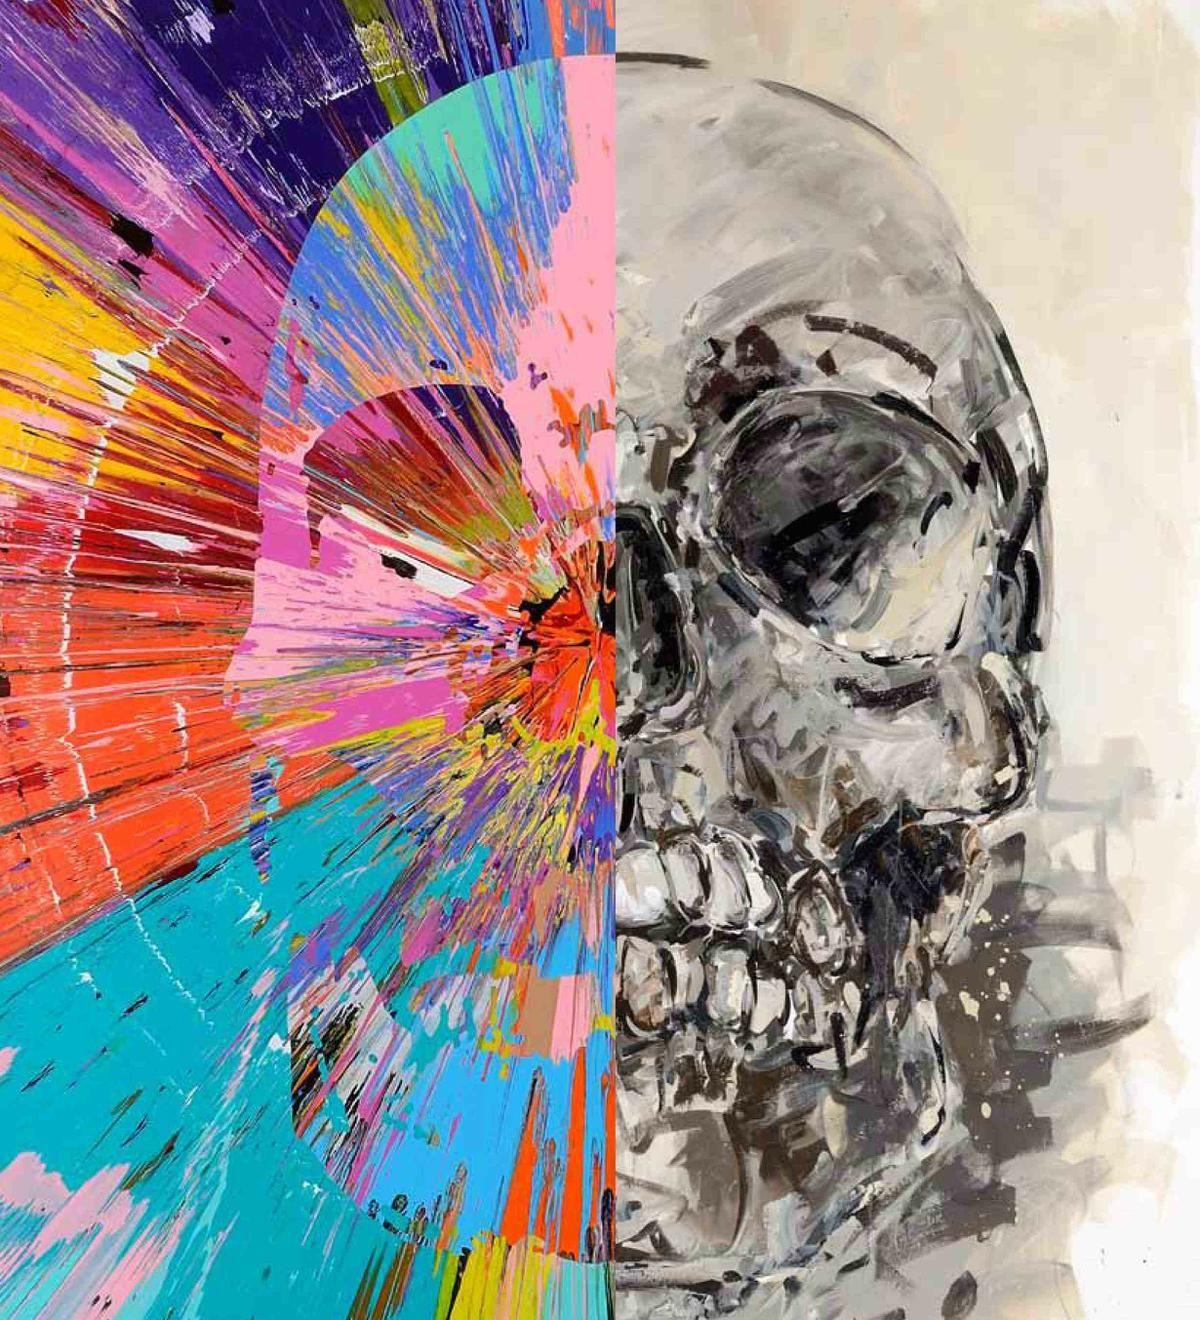 M 104901 86mg5zztlirs Jpg 1 200 1 320 Pixels Skull Painting Art Damien Hirst Paintings